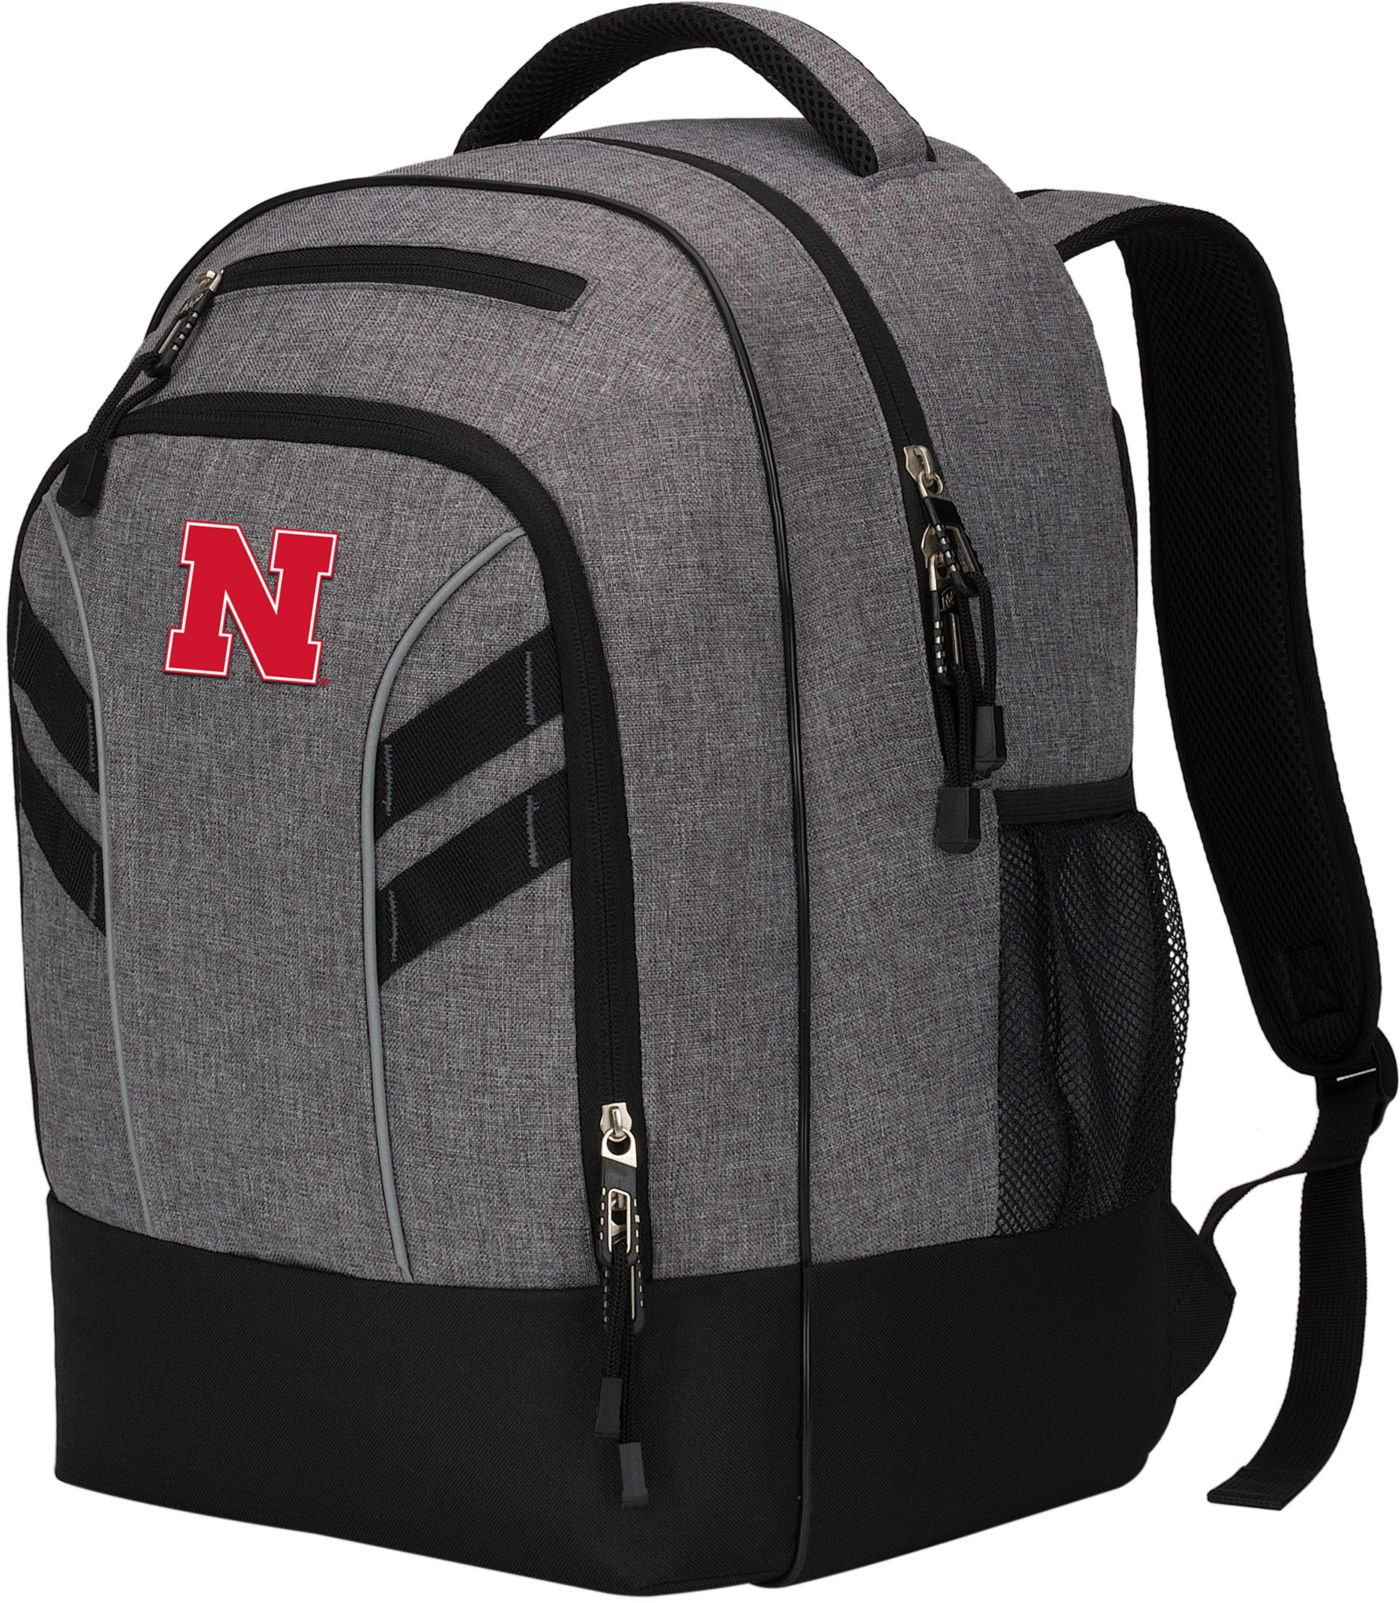 Northwest Nebraska Cornhuskers Razor Backpack